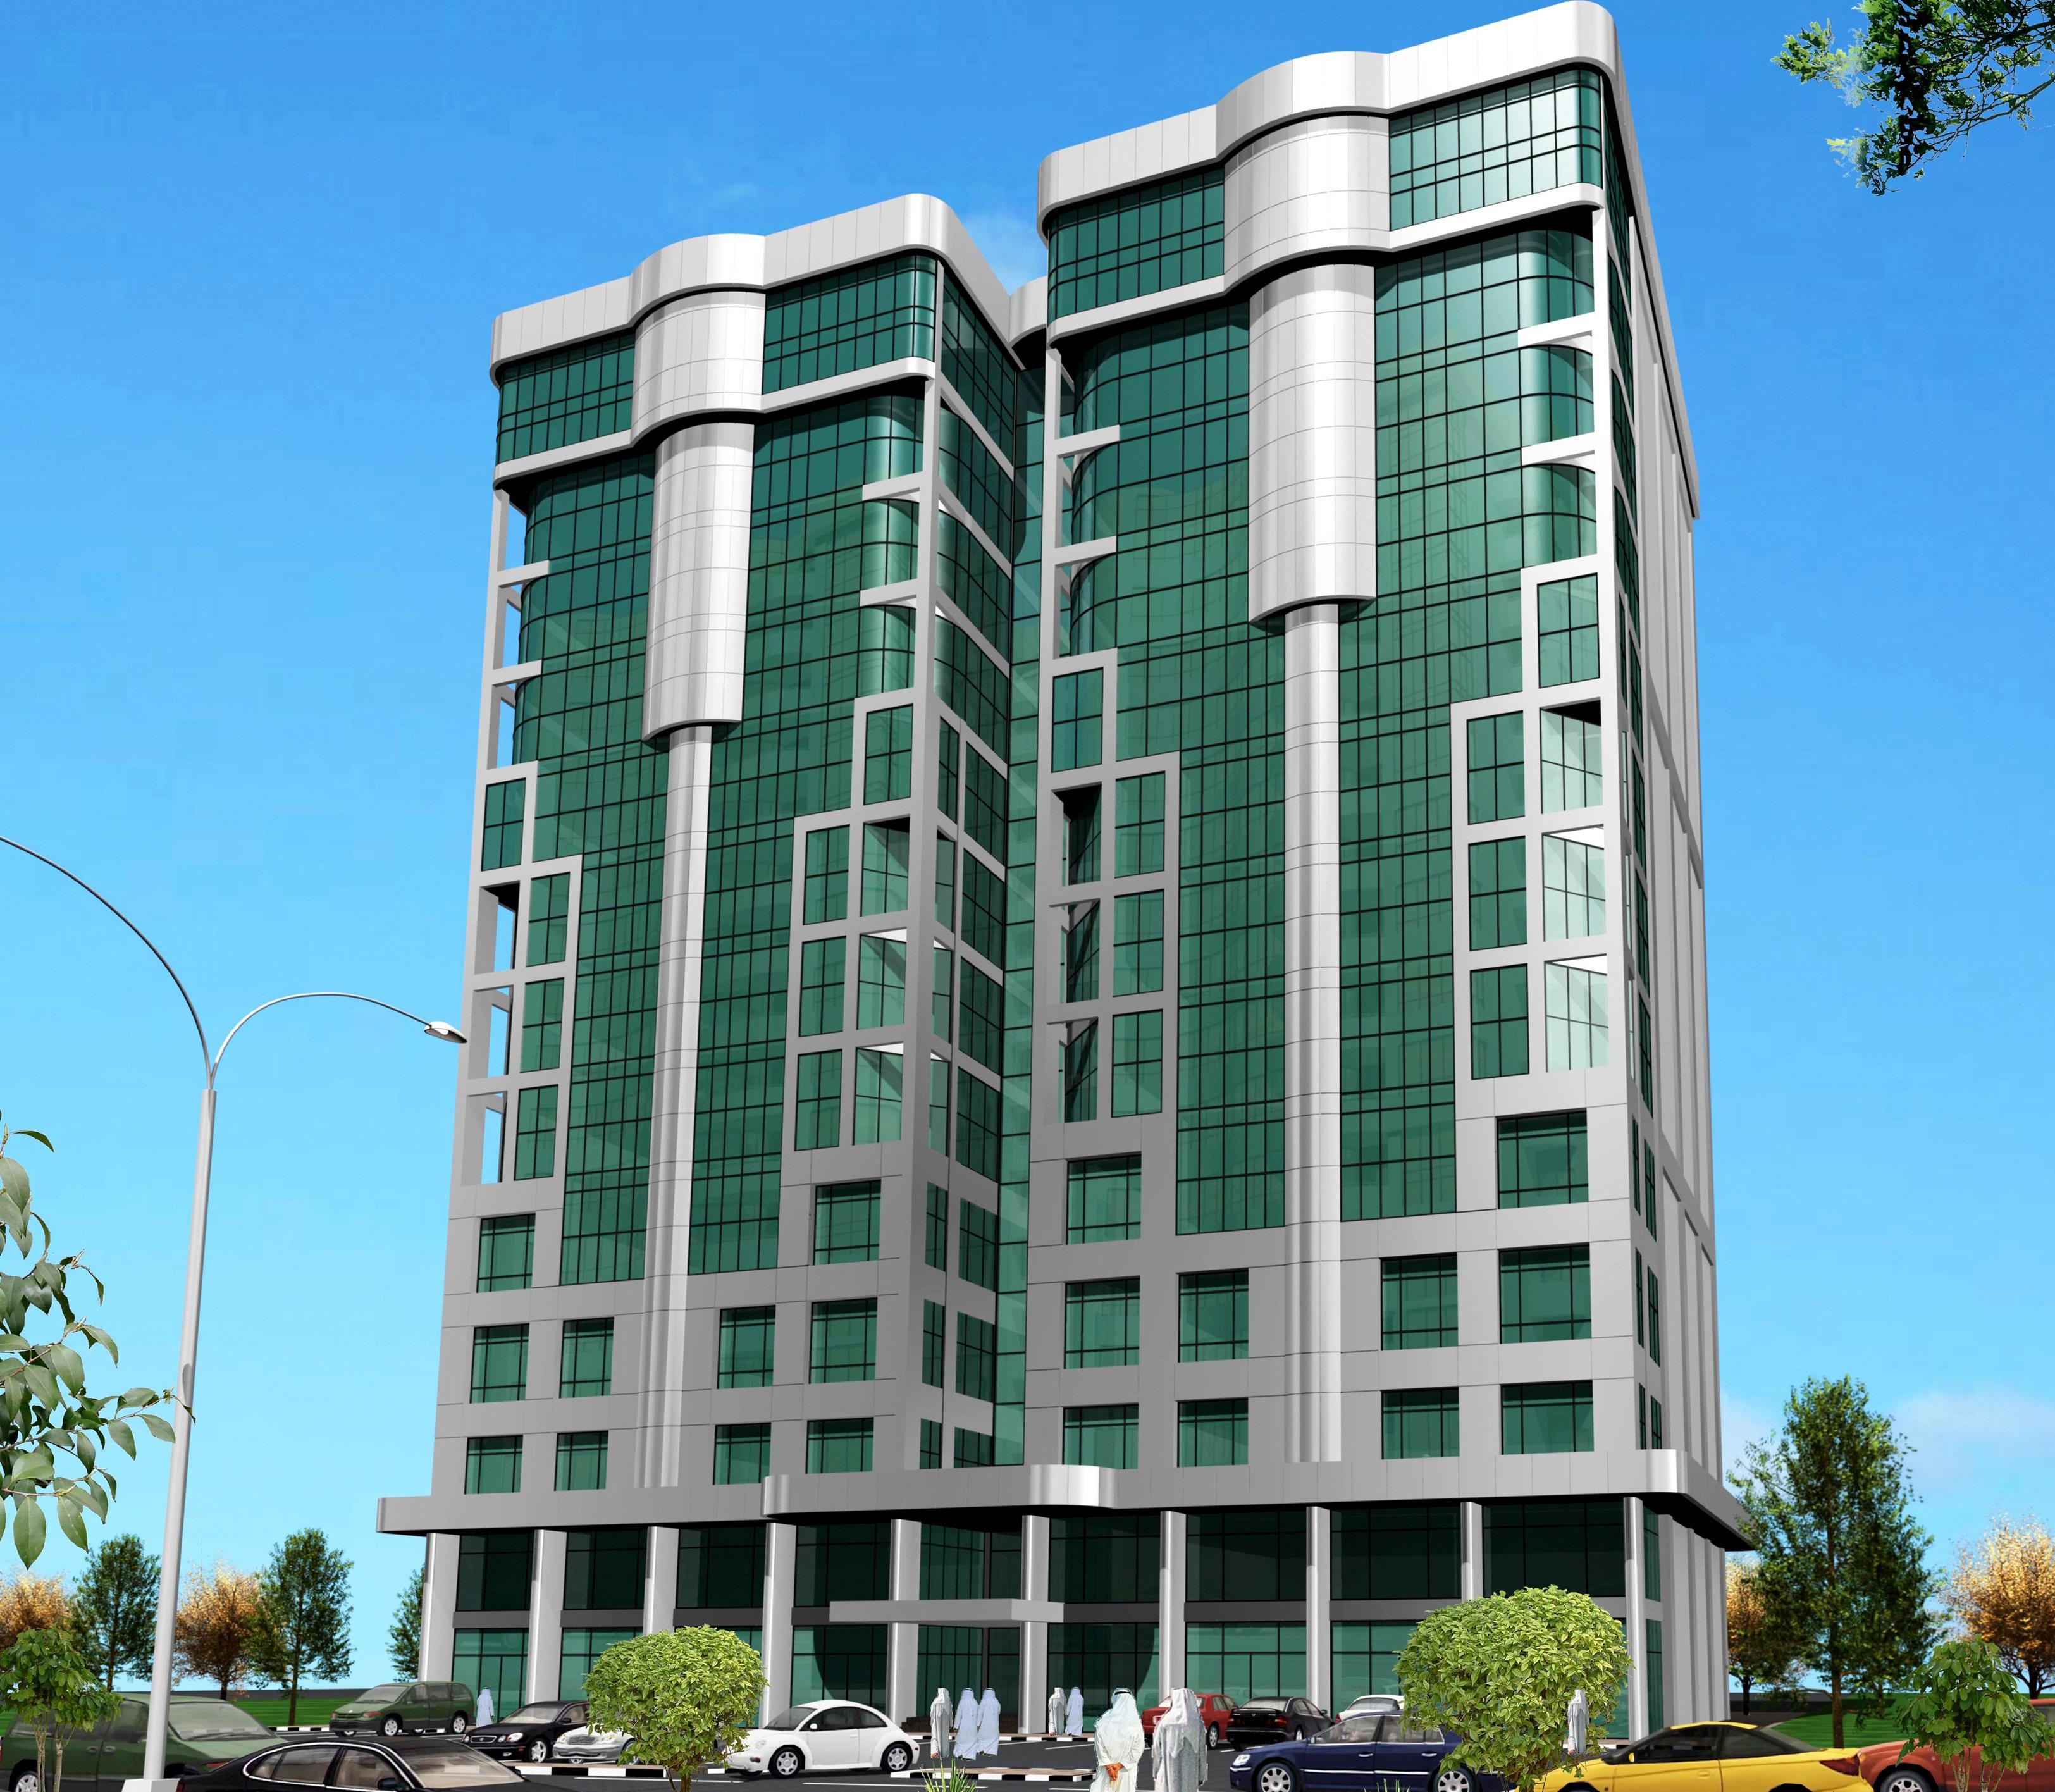 Elkanaki Ibrahim Building